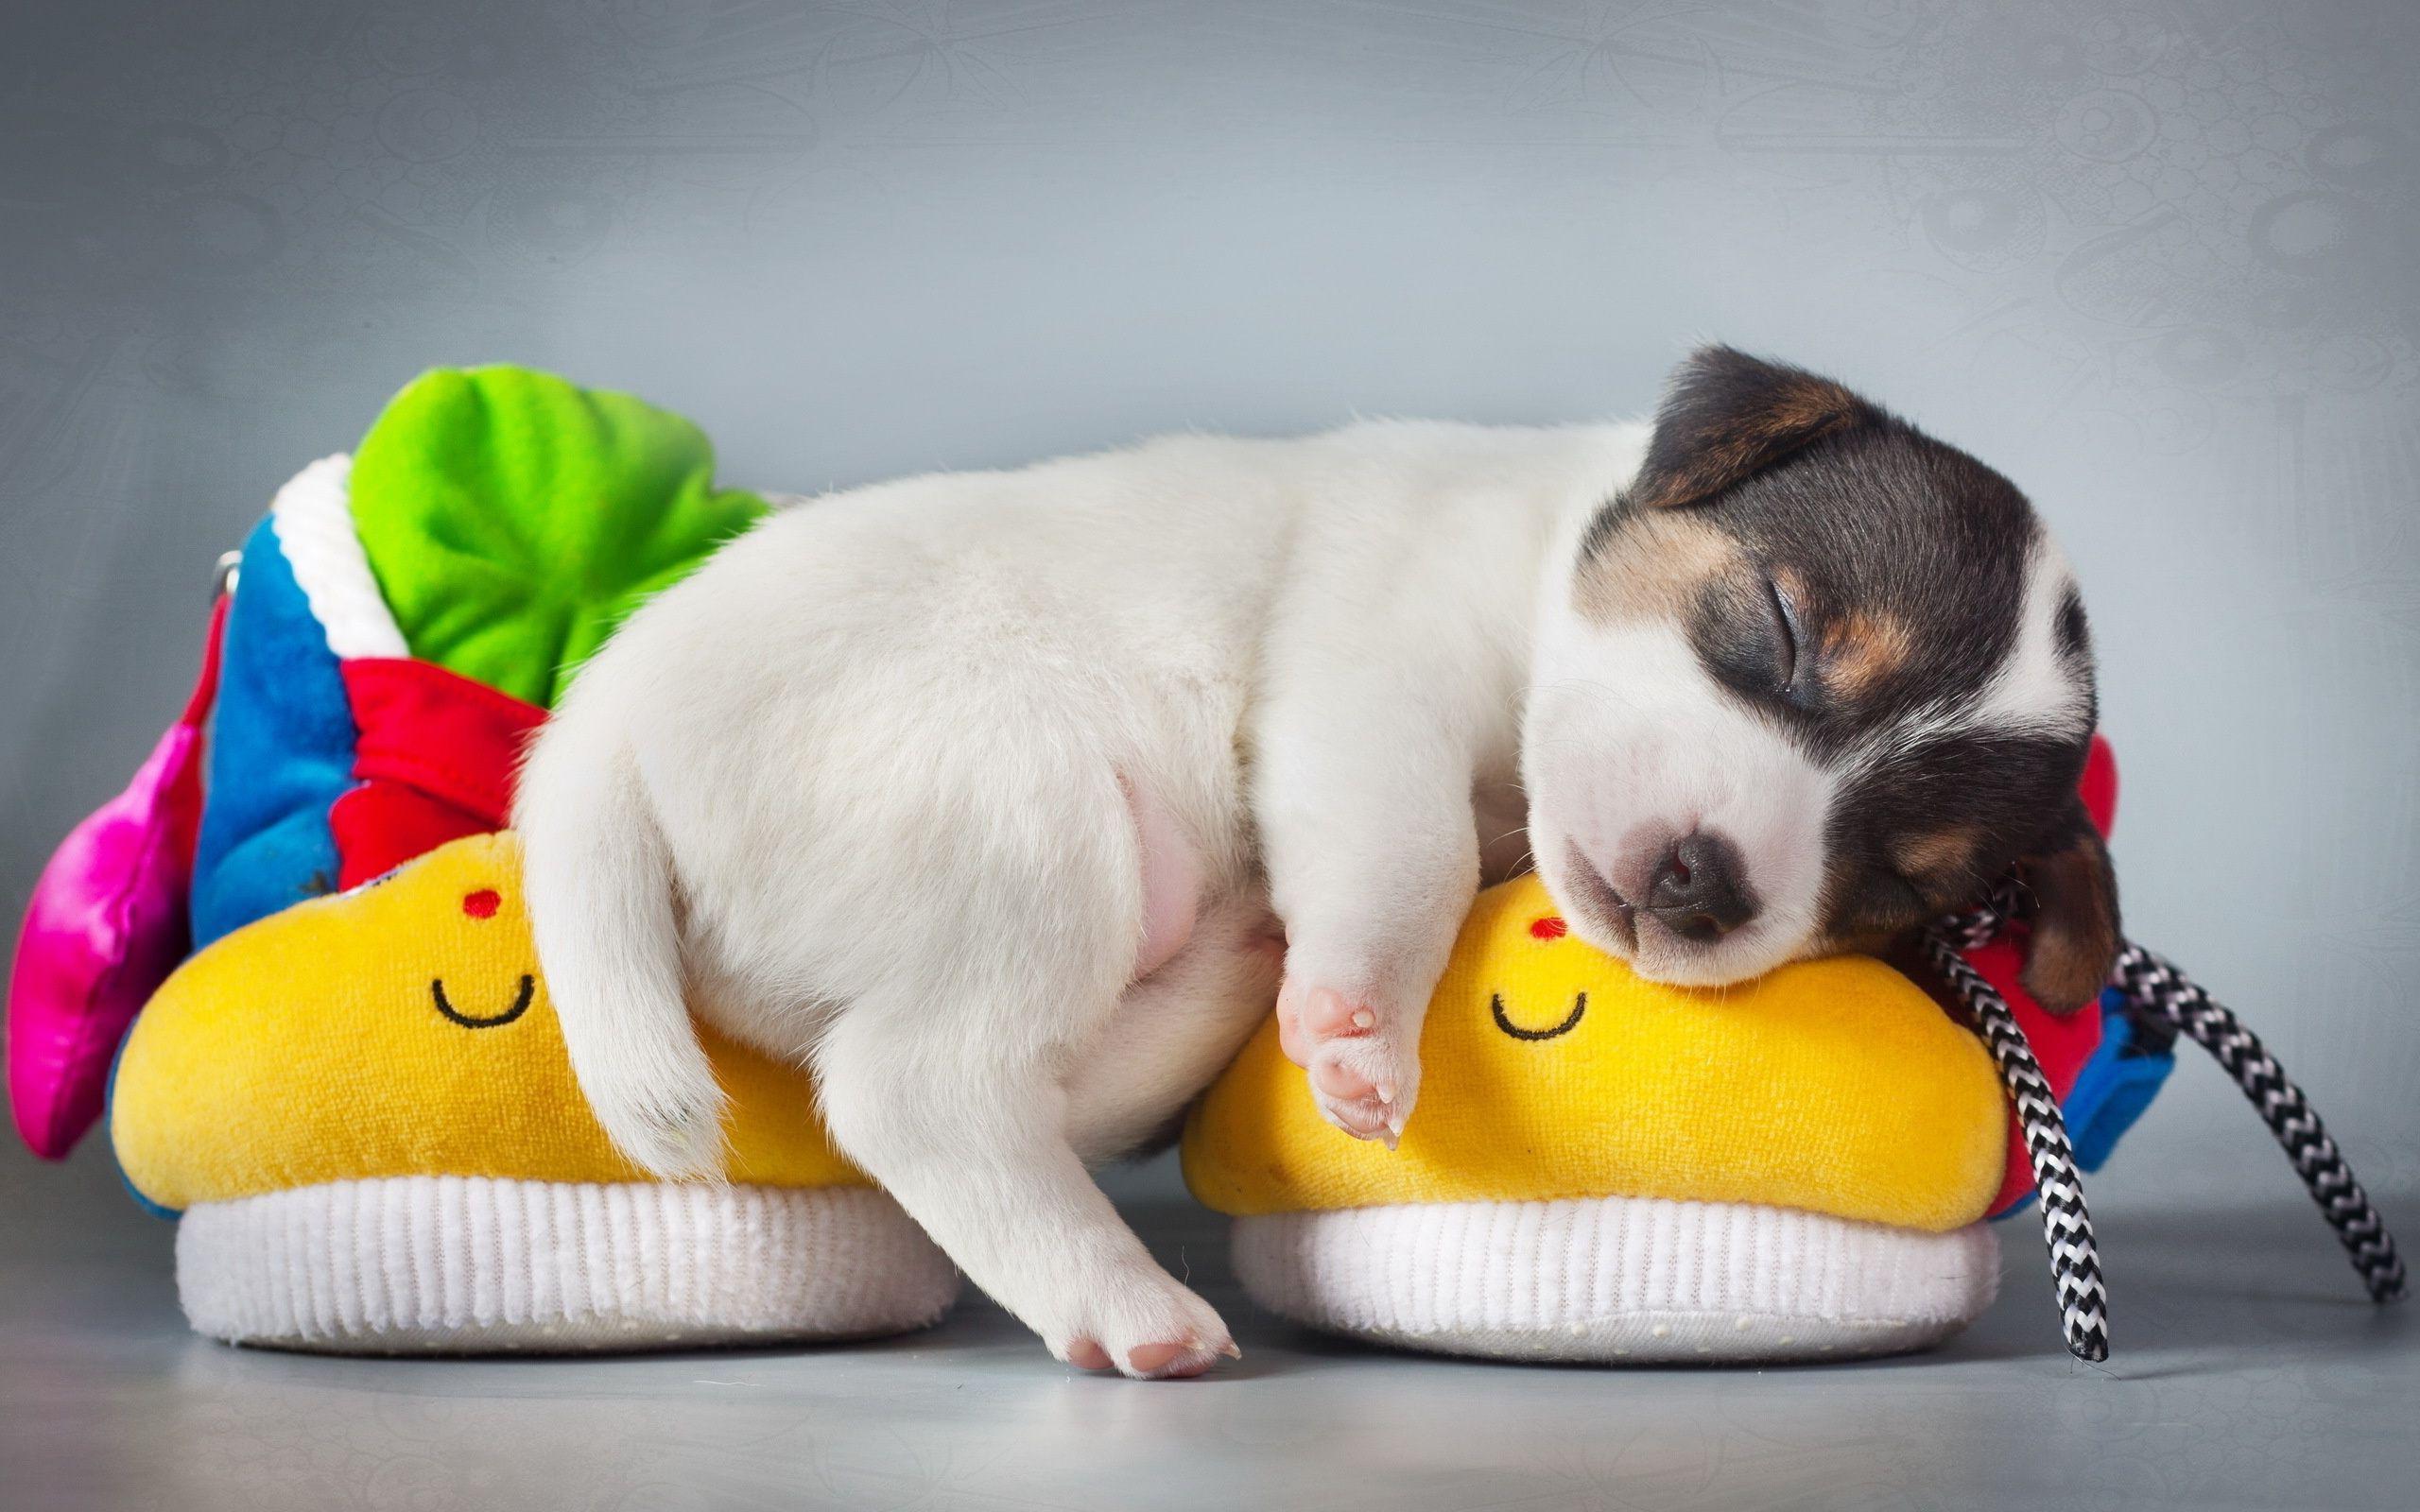 General 2560x1600 dog puppies animals sleeping